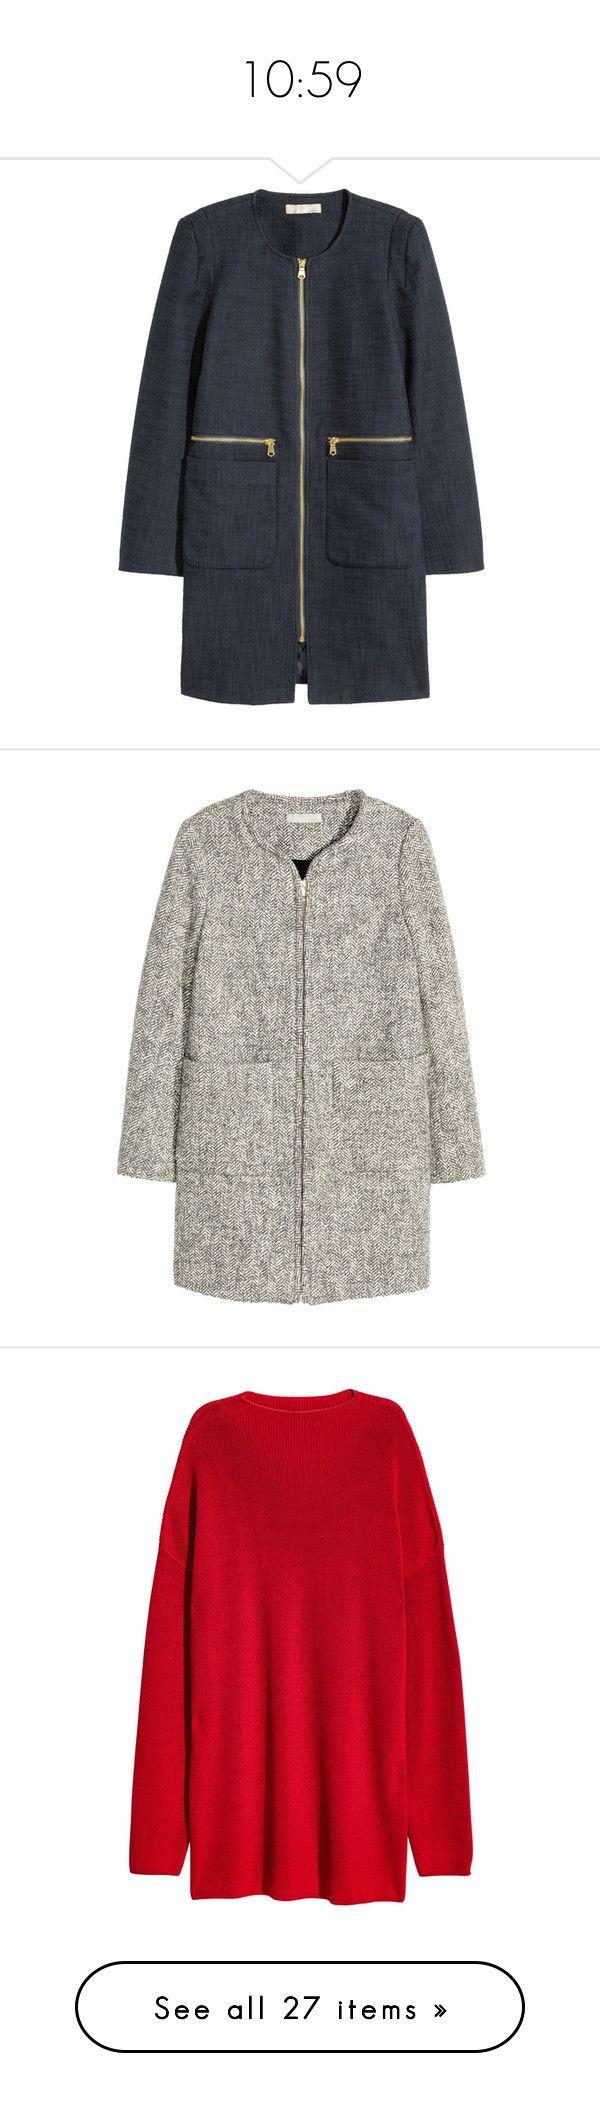 """10:59"" by adhene ❤ liked on Polyvore featuring outerwear, coats, short coat, zip coat, fur-lined coats, h&m coats, grey, grey coat, herringbone coats and gray coat"